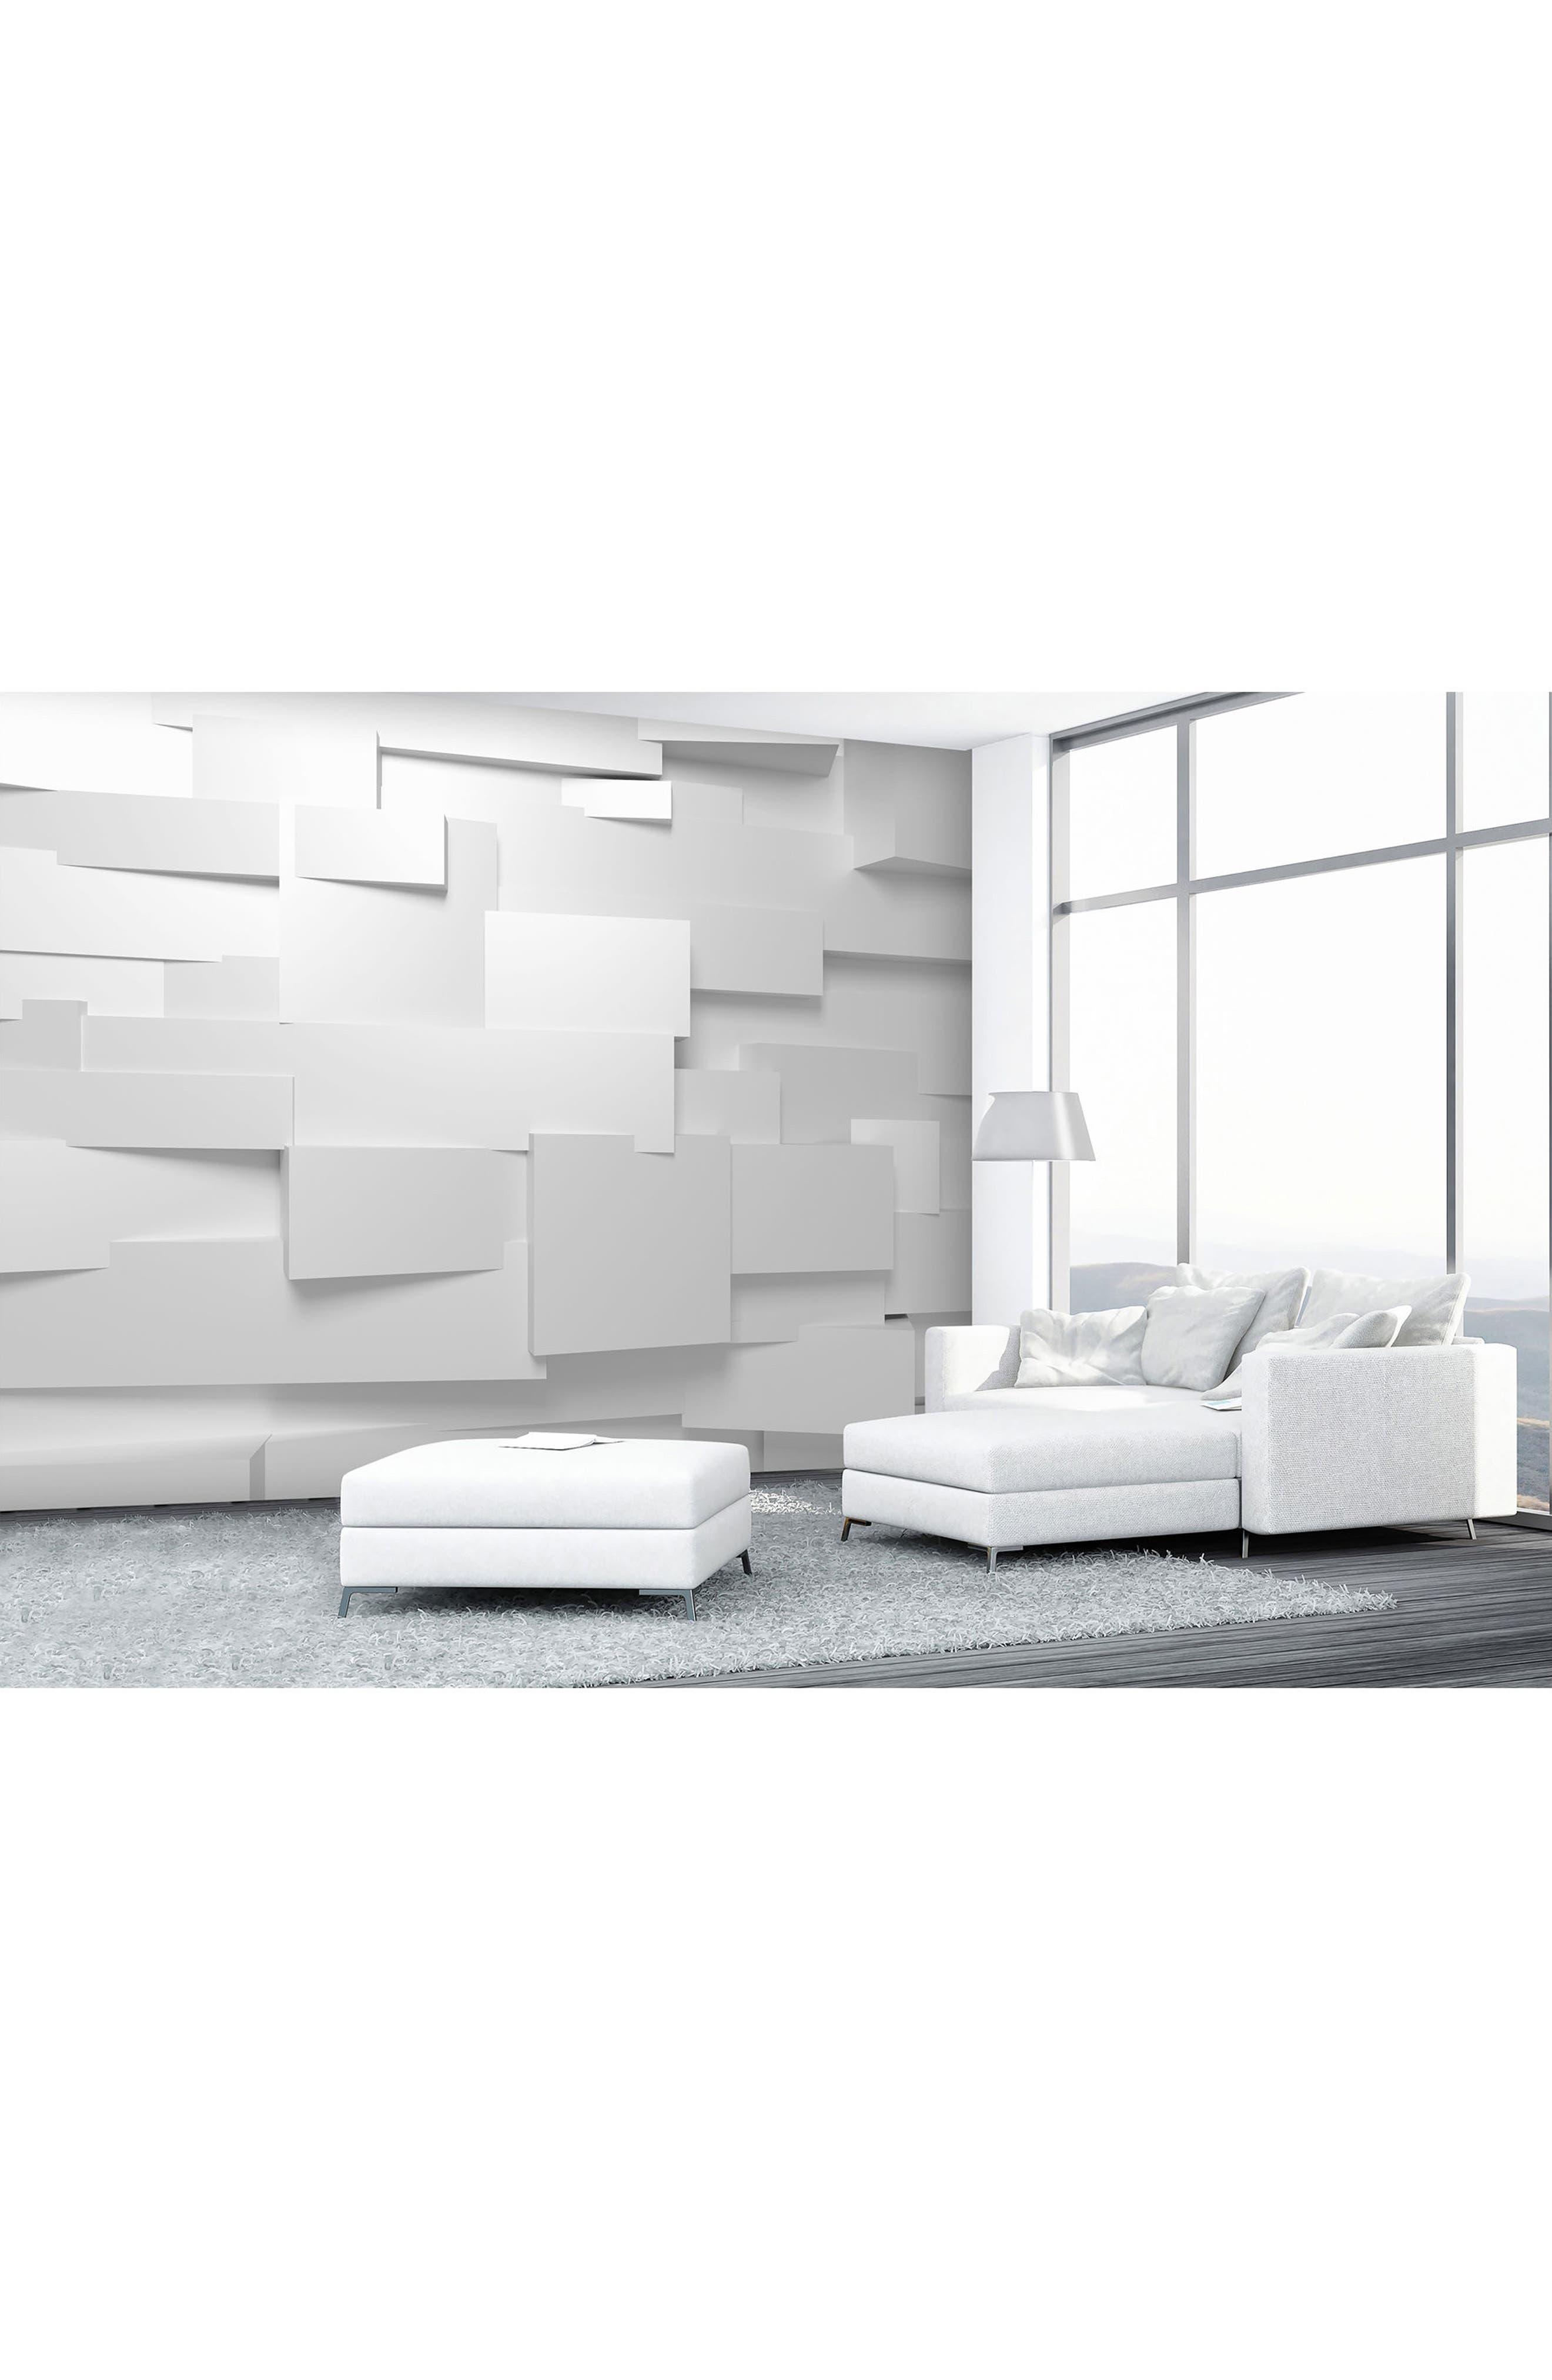 3D Effect 8-Panel Wall Mural,                             Alternate thumbnail 2, color,                             White Multi